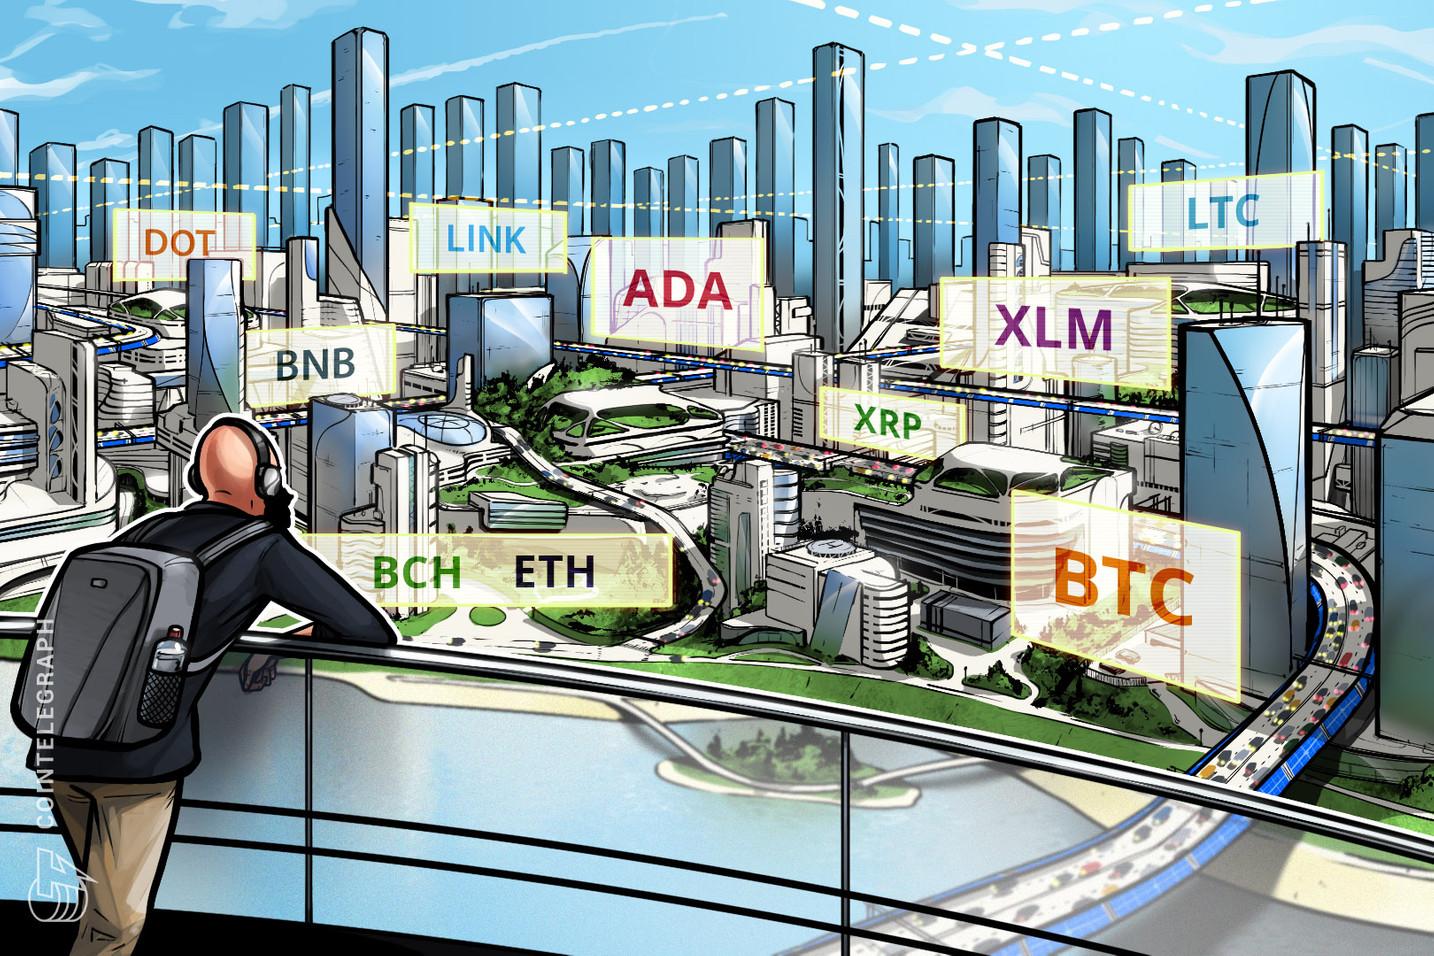 Análisis de precios al 15/02: BTC, ETH, ADA, XRP, DOT, BNB, LTC, BCH, LINK, XLM